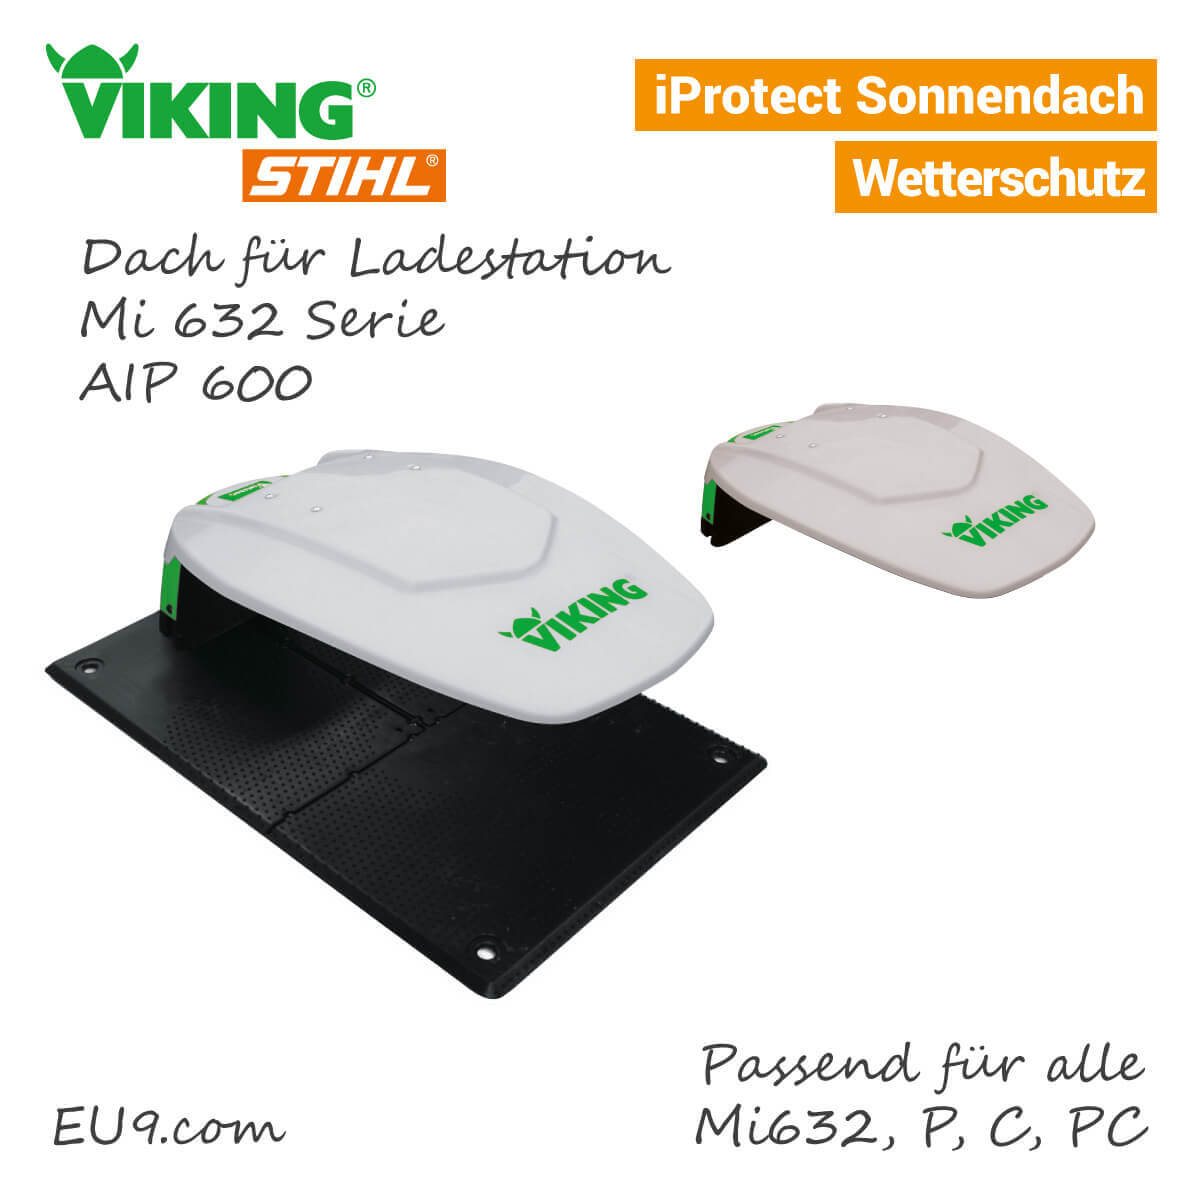 viking iprotect dach aip 600 m hroboter garage g nstig bei eu9 kaufen. Black Bedroom Furniture Sets. Home Design Ideas